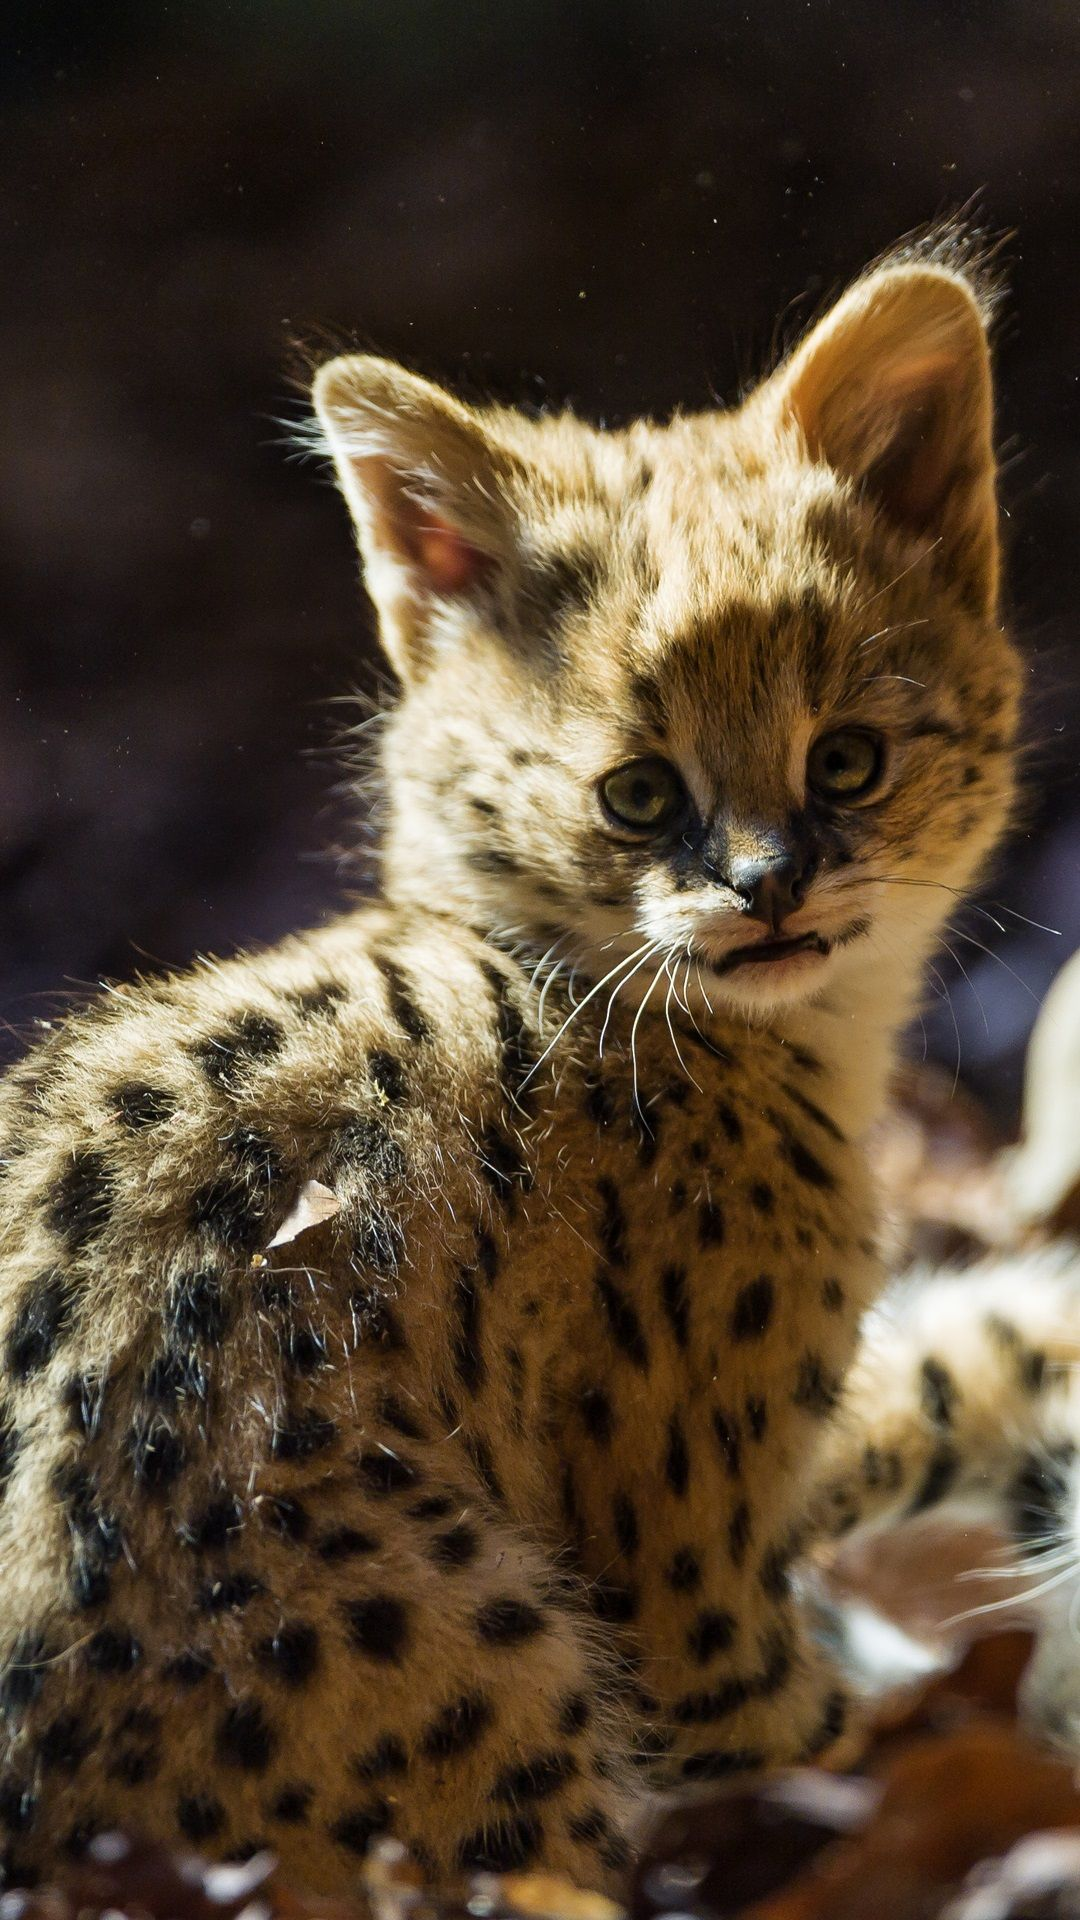 Serval cat, kitten iPhone 6 (6S) Plus wallpaper